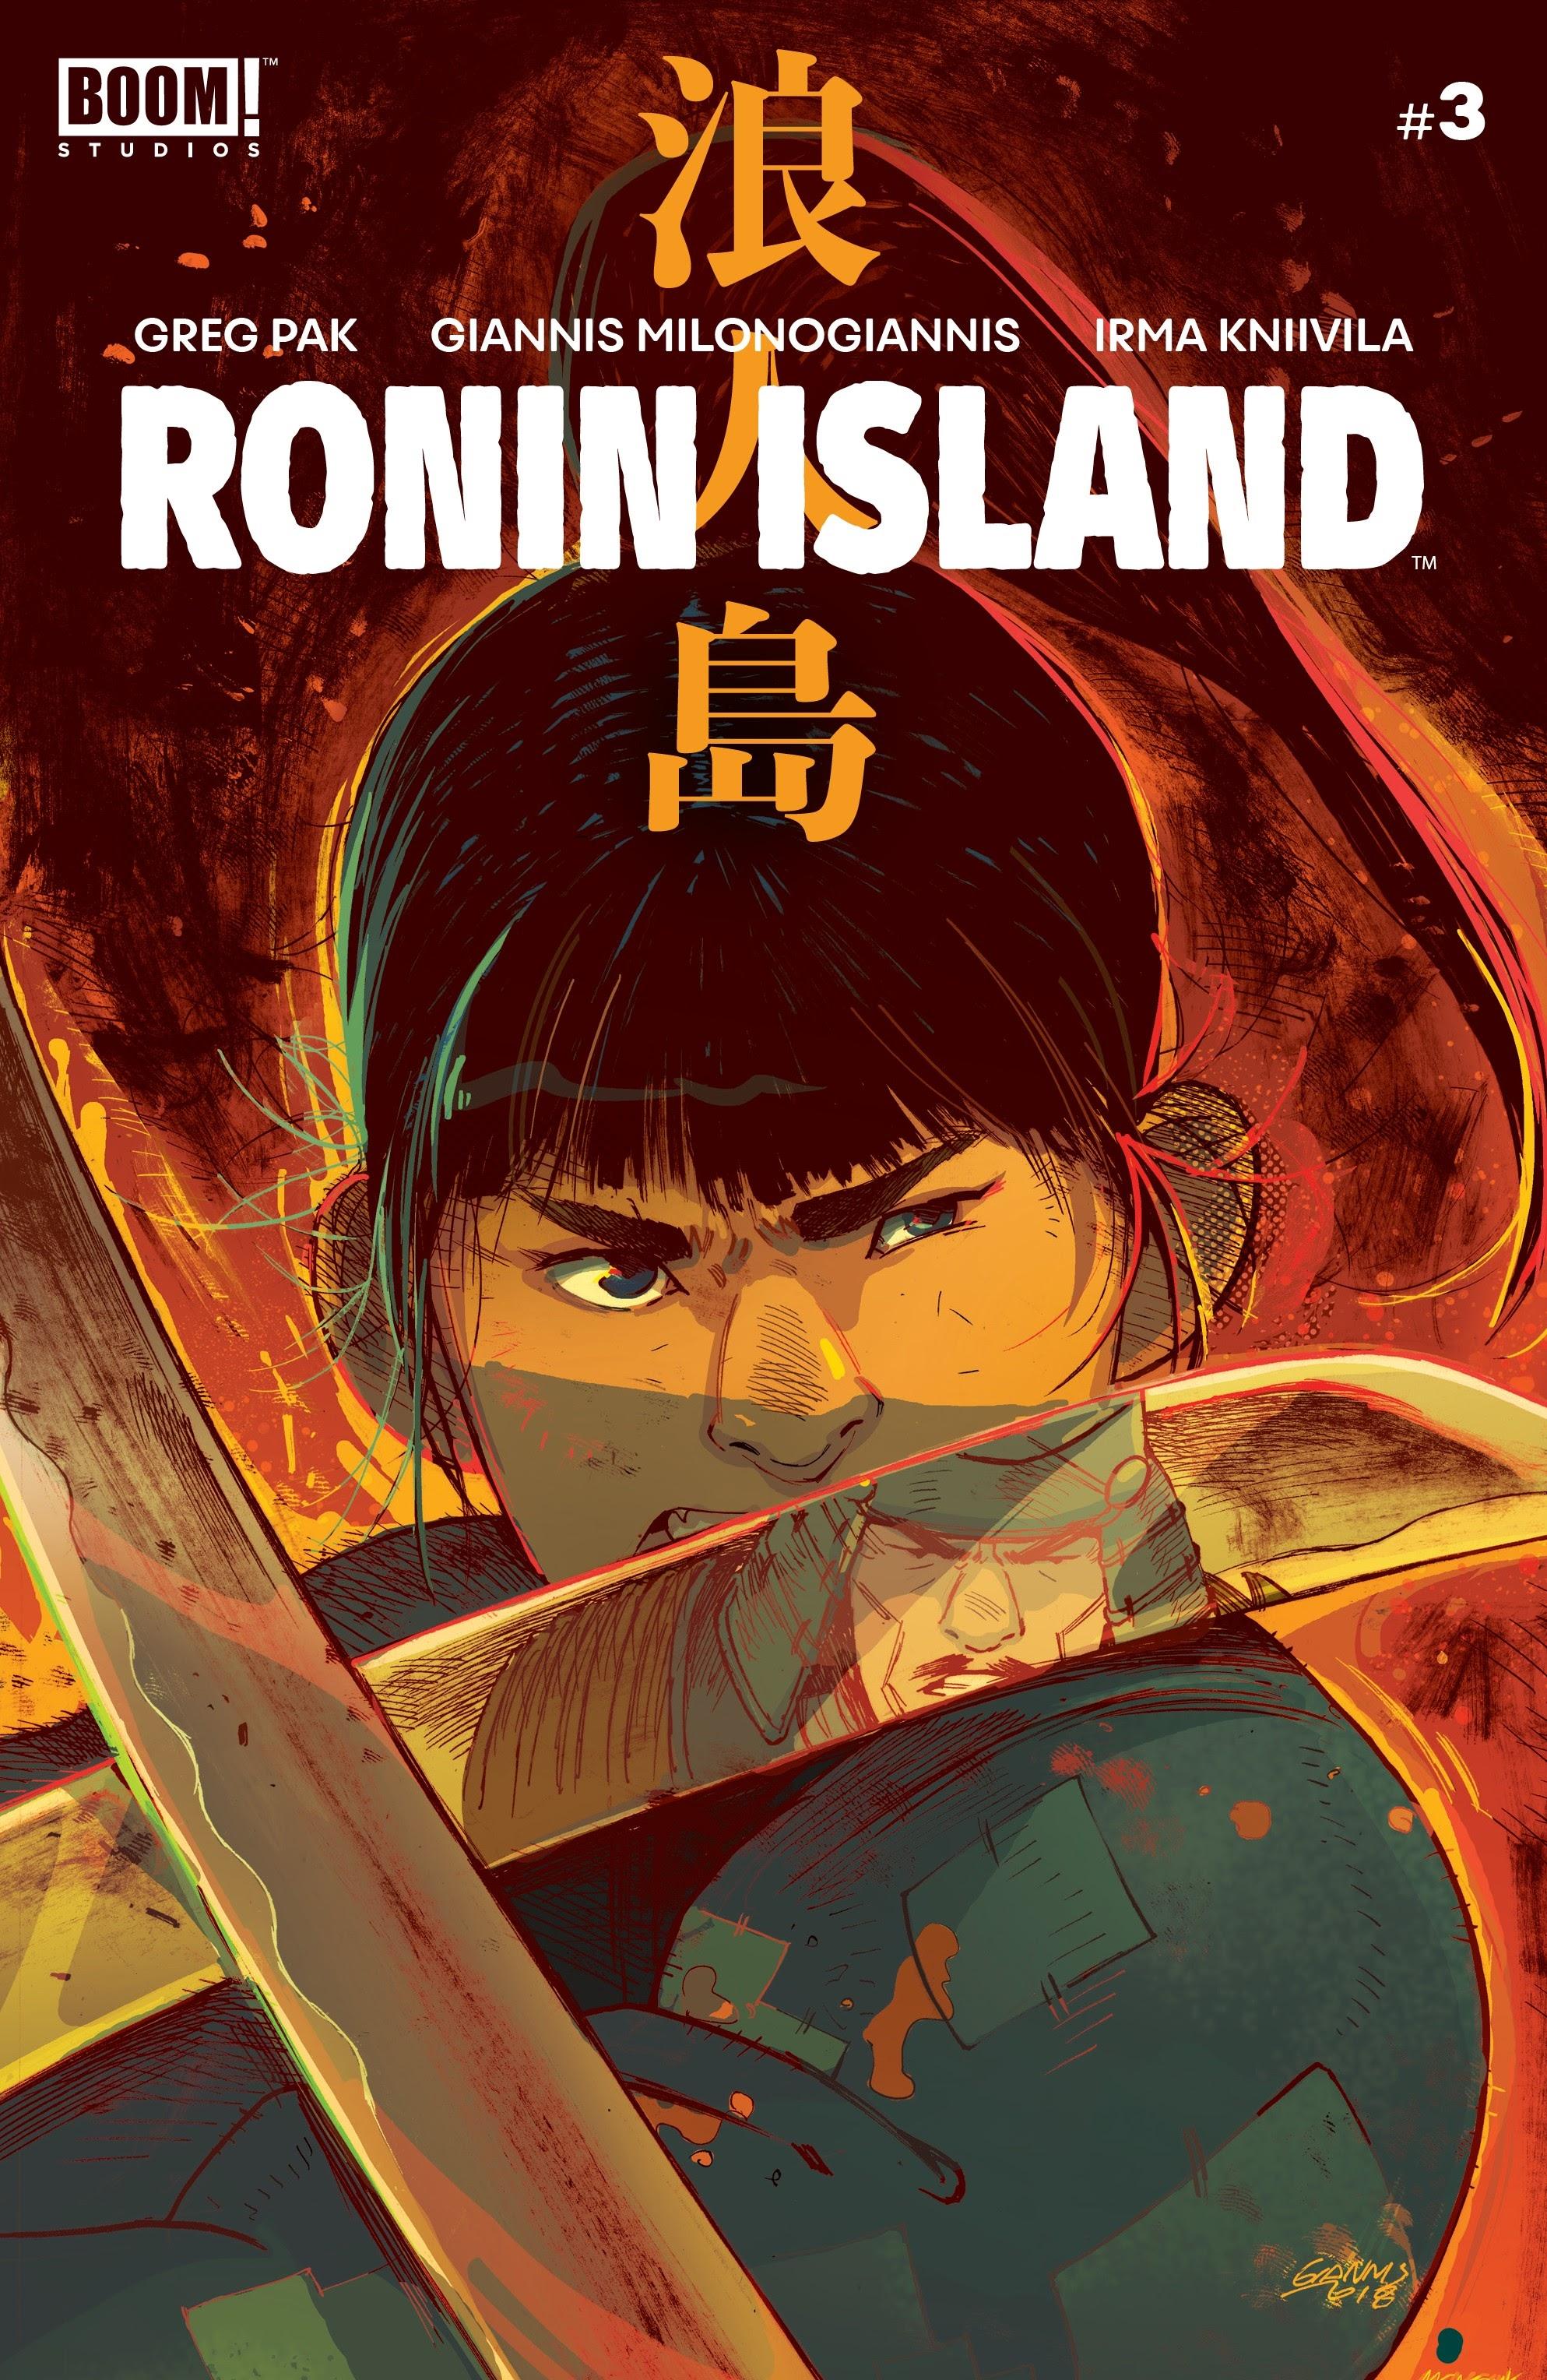 Read online Ronin Island comic -  Issue #3 - 1